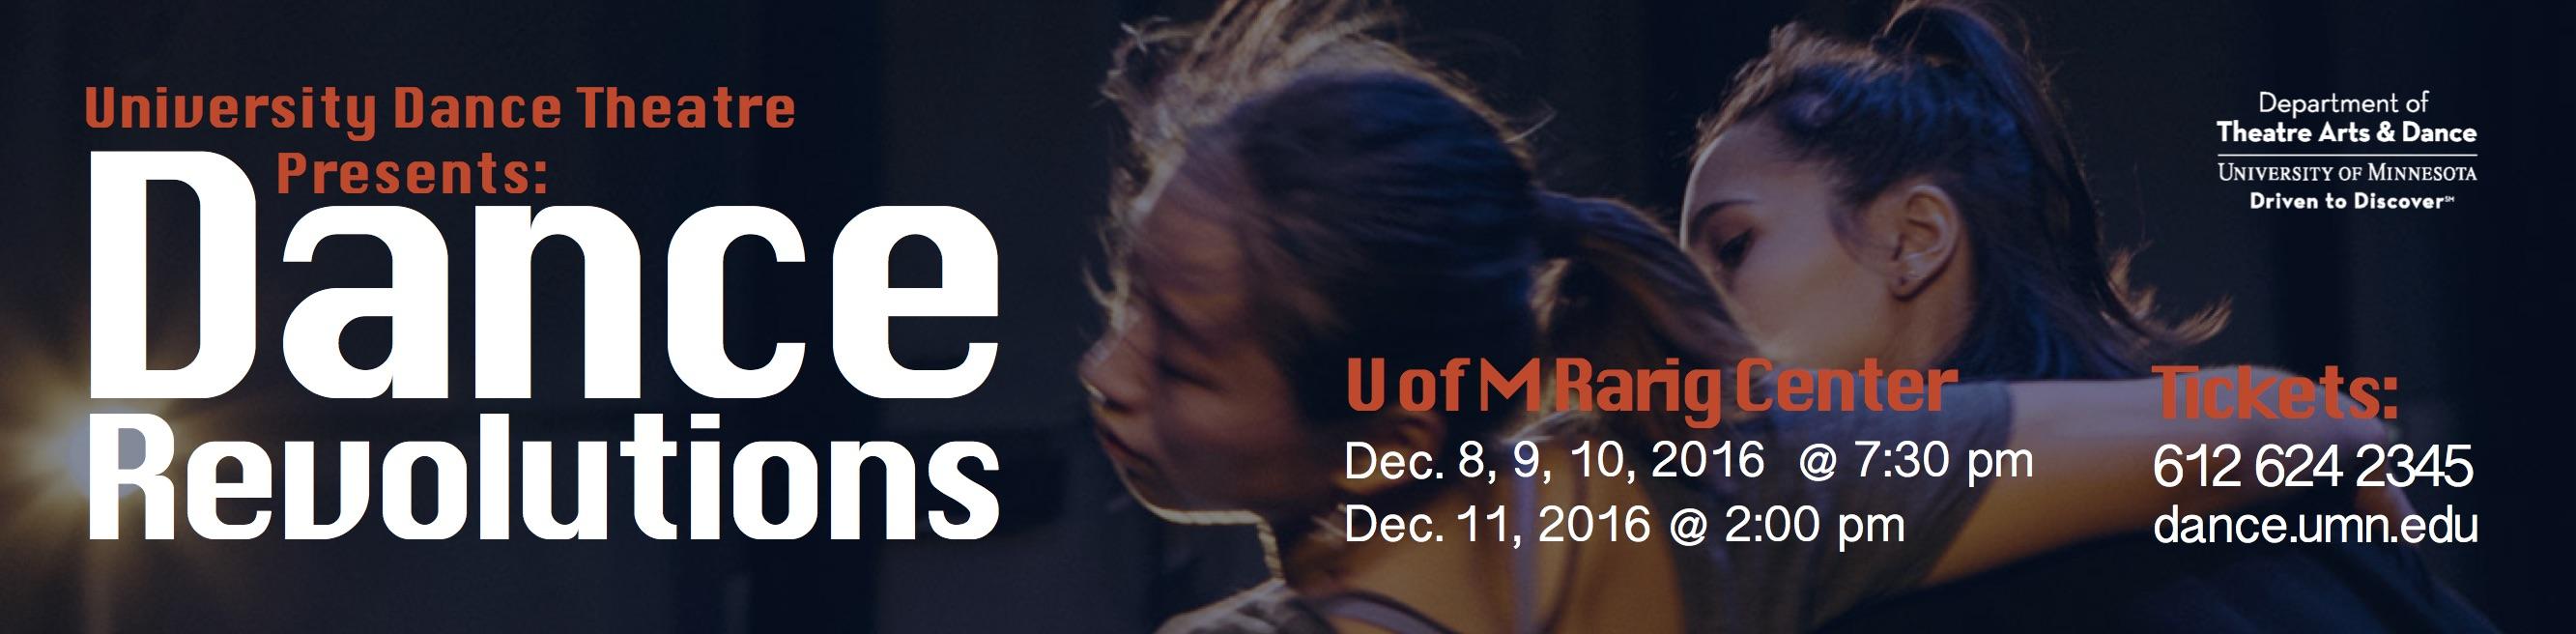 University of Minnesota Theatre Arts & Dance Presents: University Dance Theatre - December 8th through 11th!